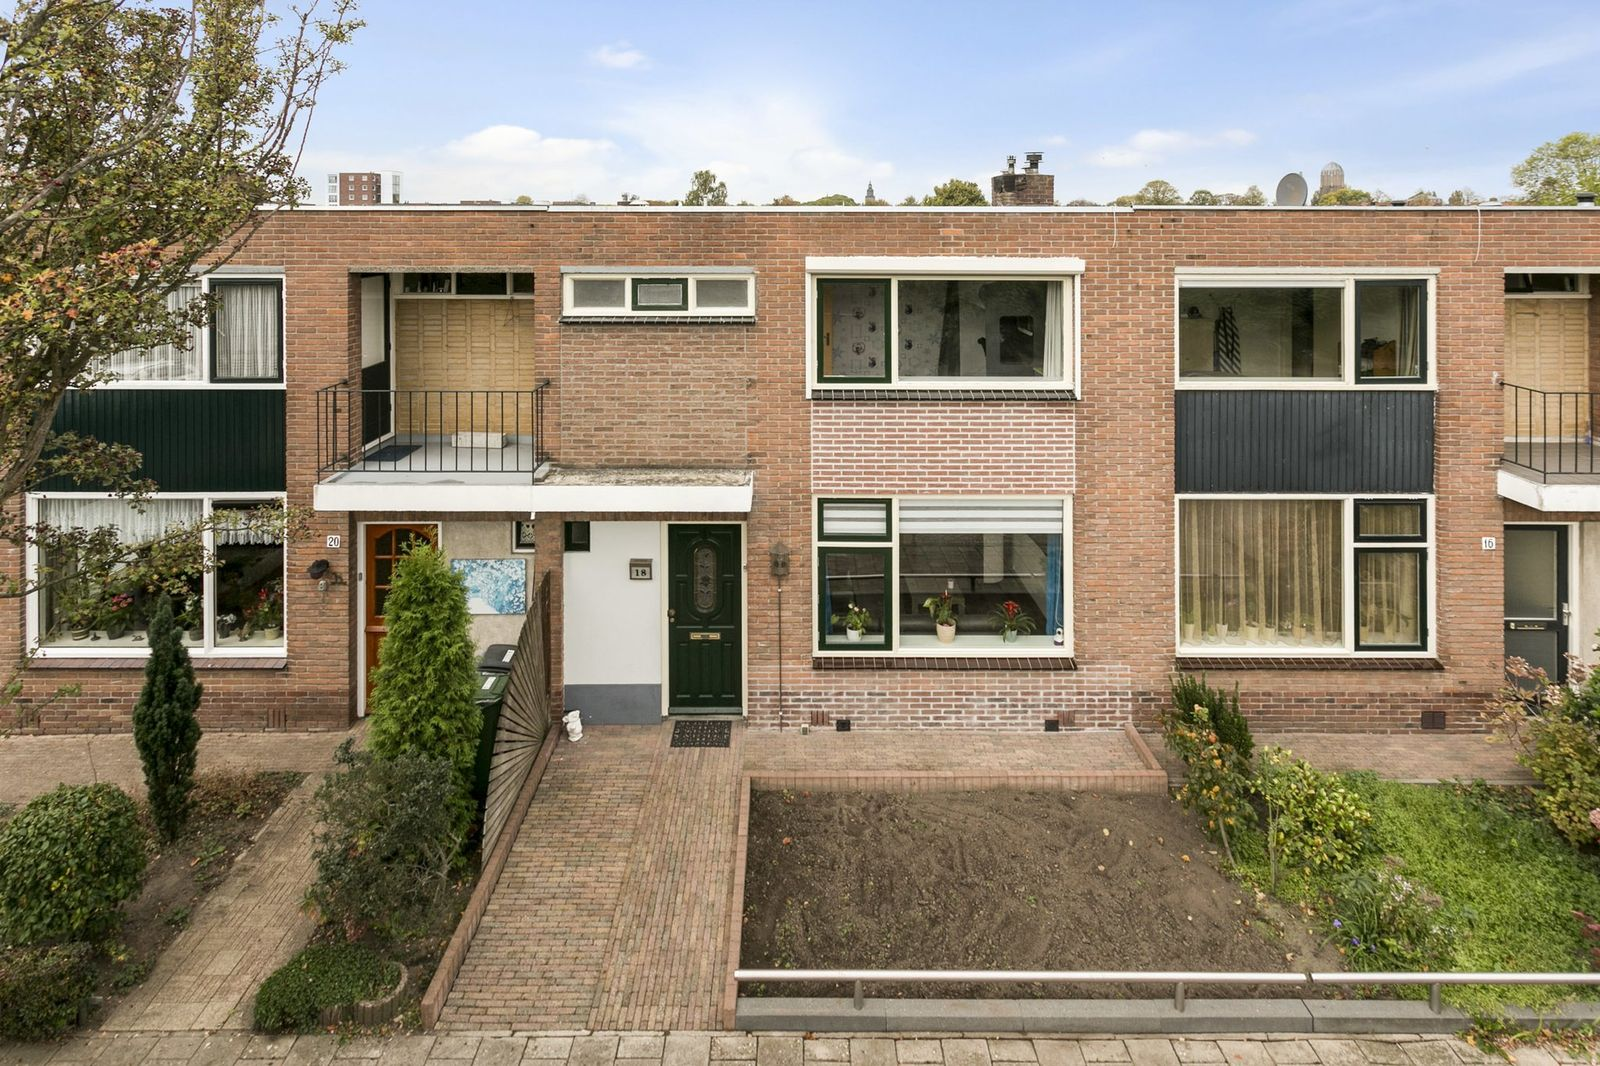 Multatulistraat 18, Zutphen